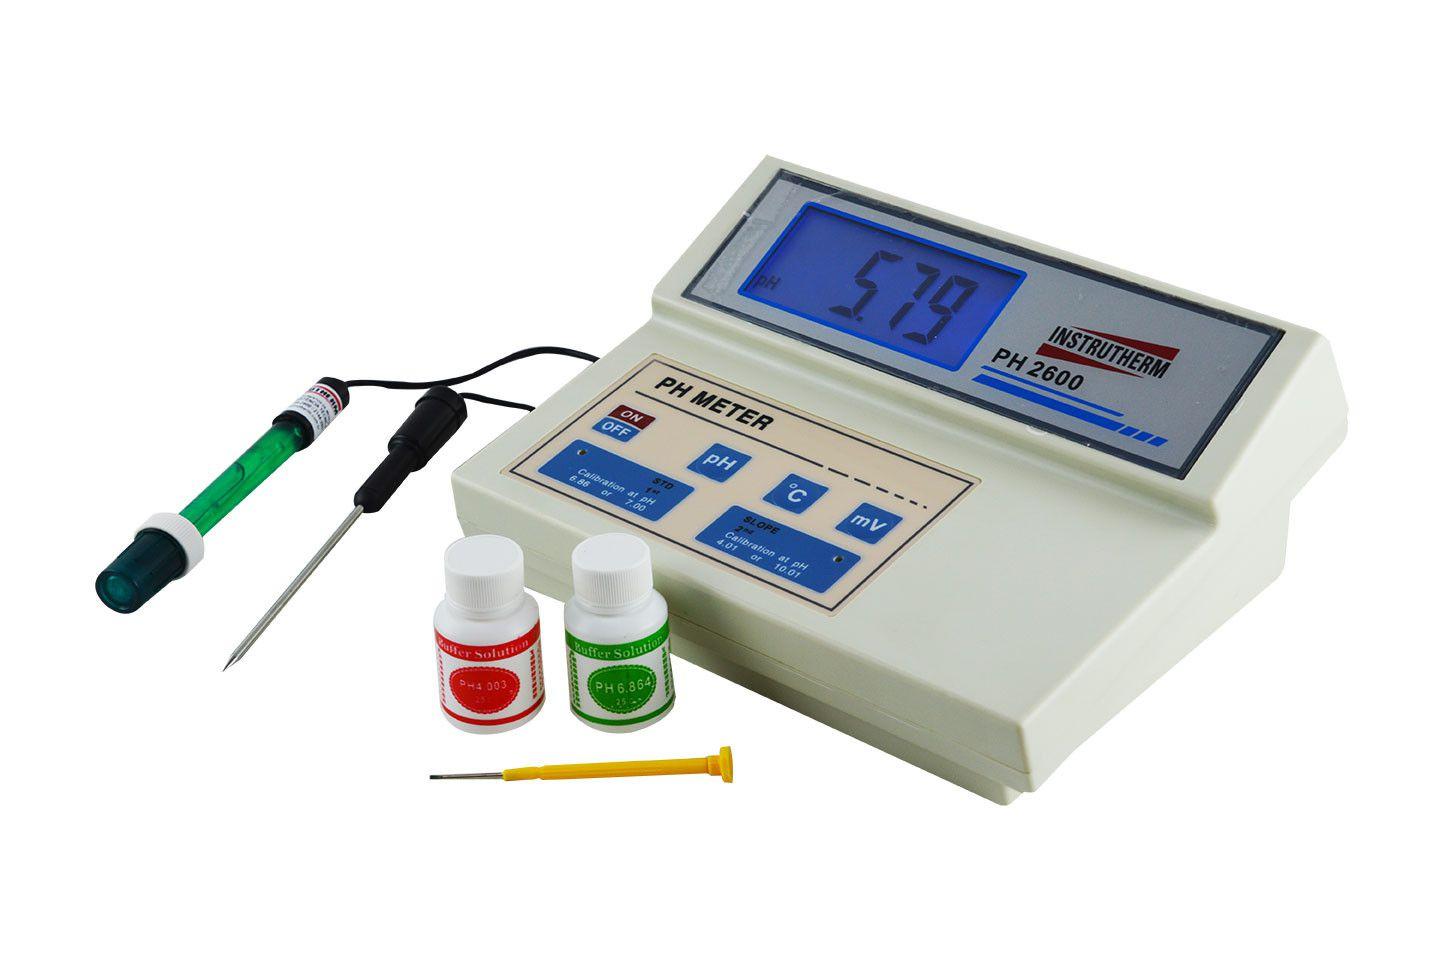 Medidor de PH / MV / Temperatura . Digital de bancada MOD. PH-2600